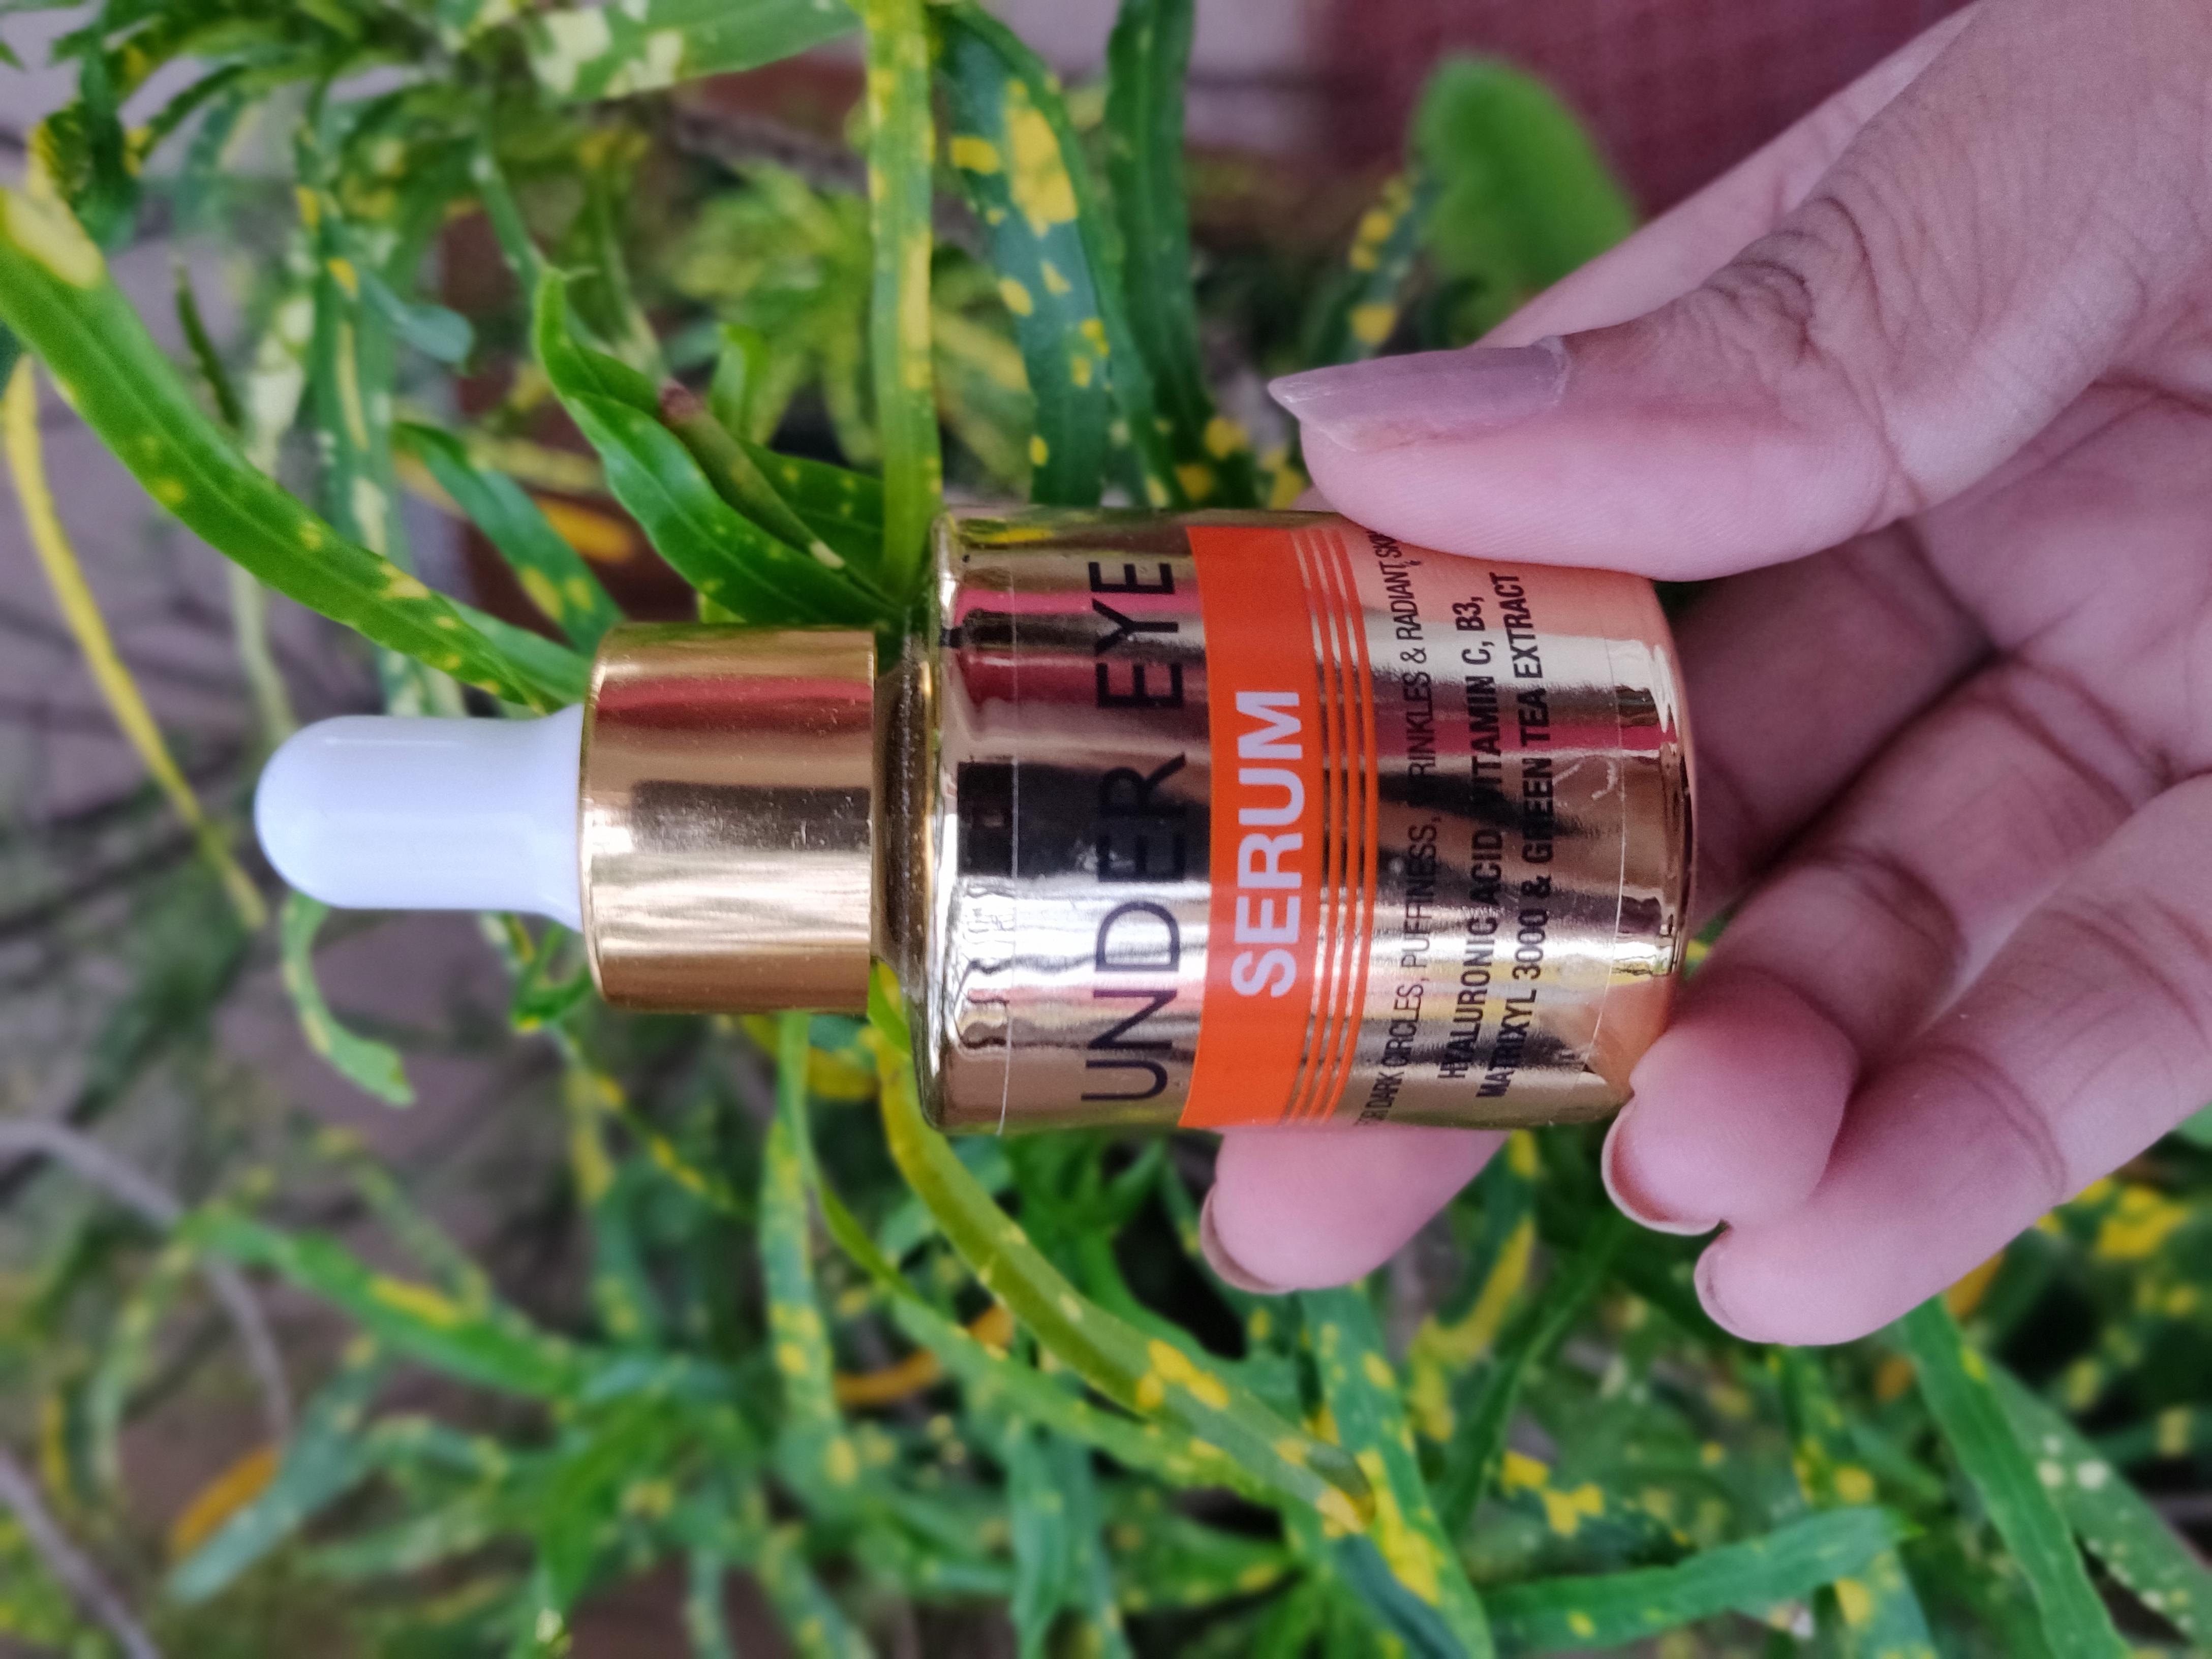 StBotanica Pure Radiance Under Eye Serum-Very effective against dark circles under the eye-By anamika_sinha